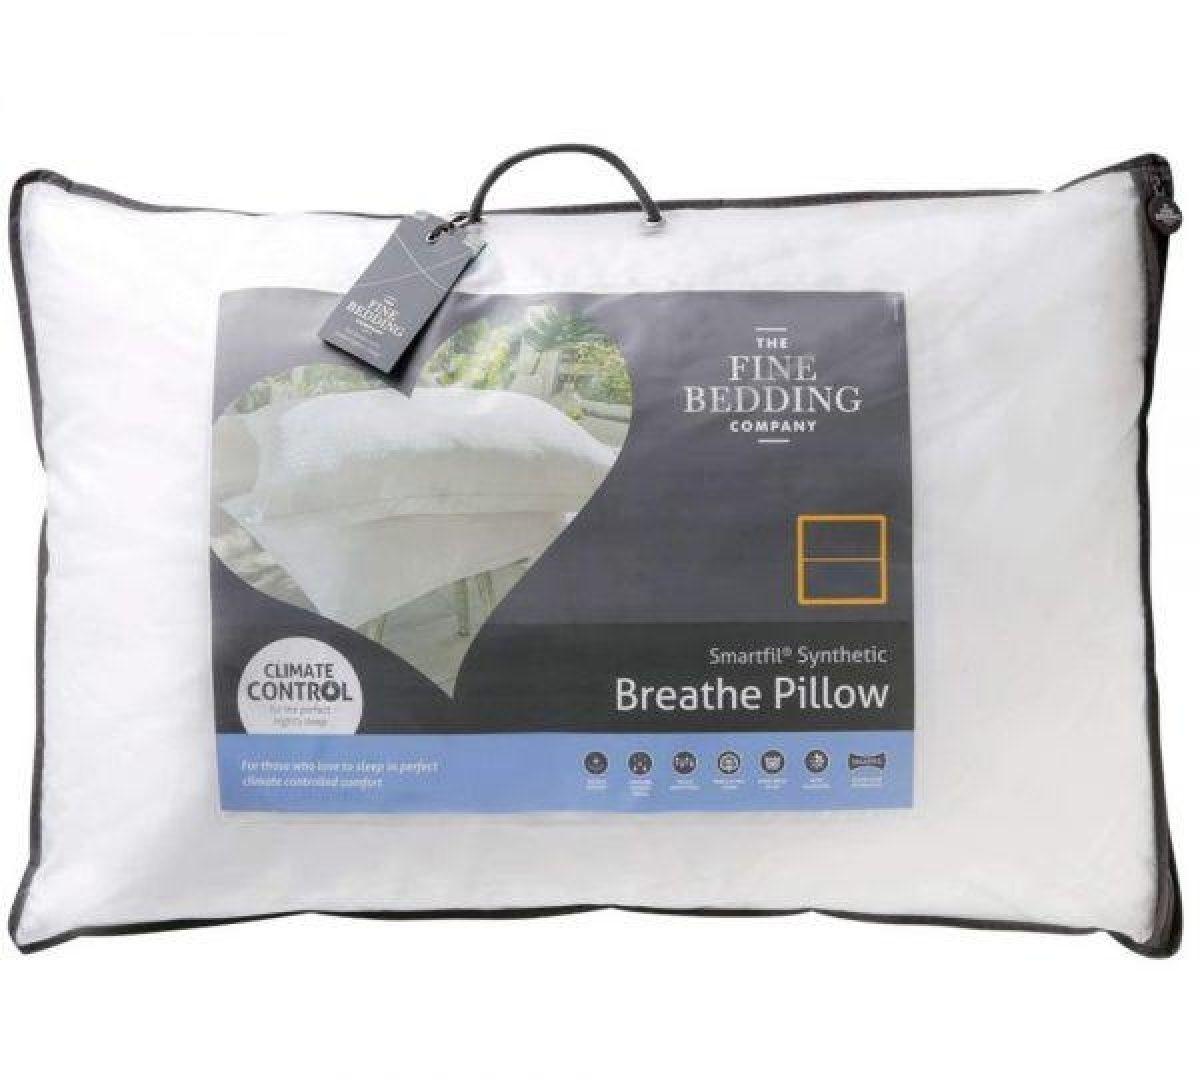 Breathe pillow 600x540